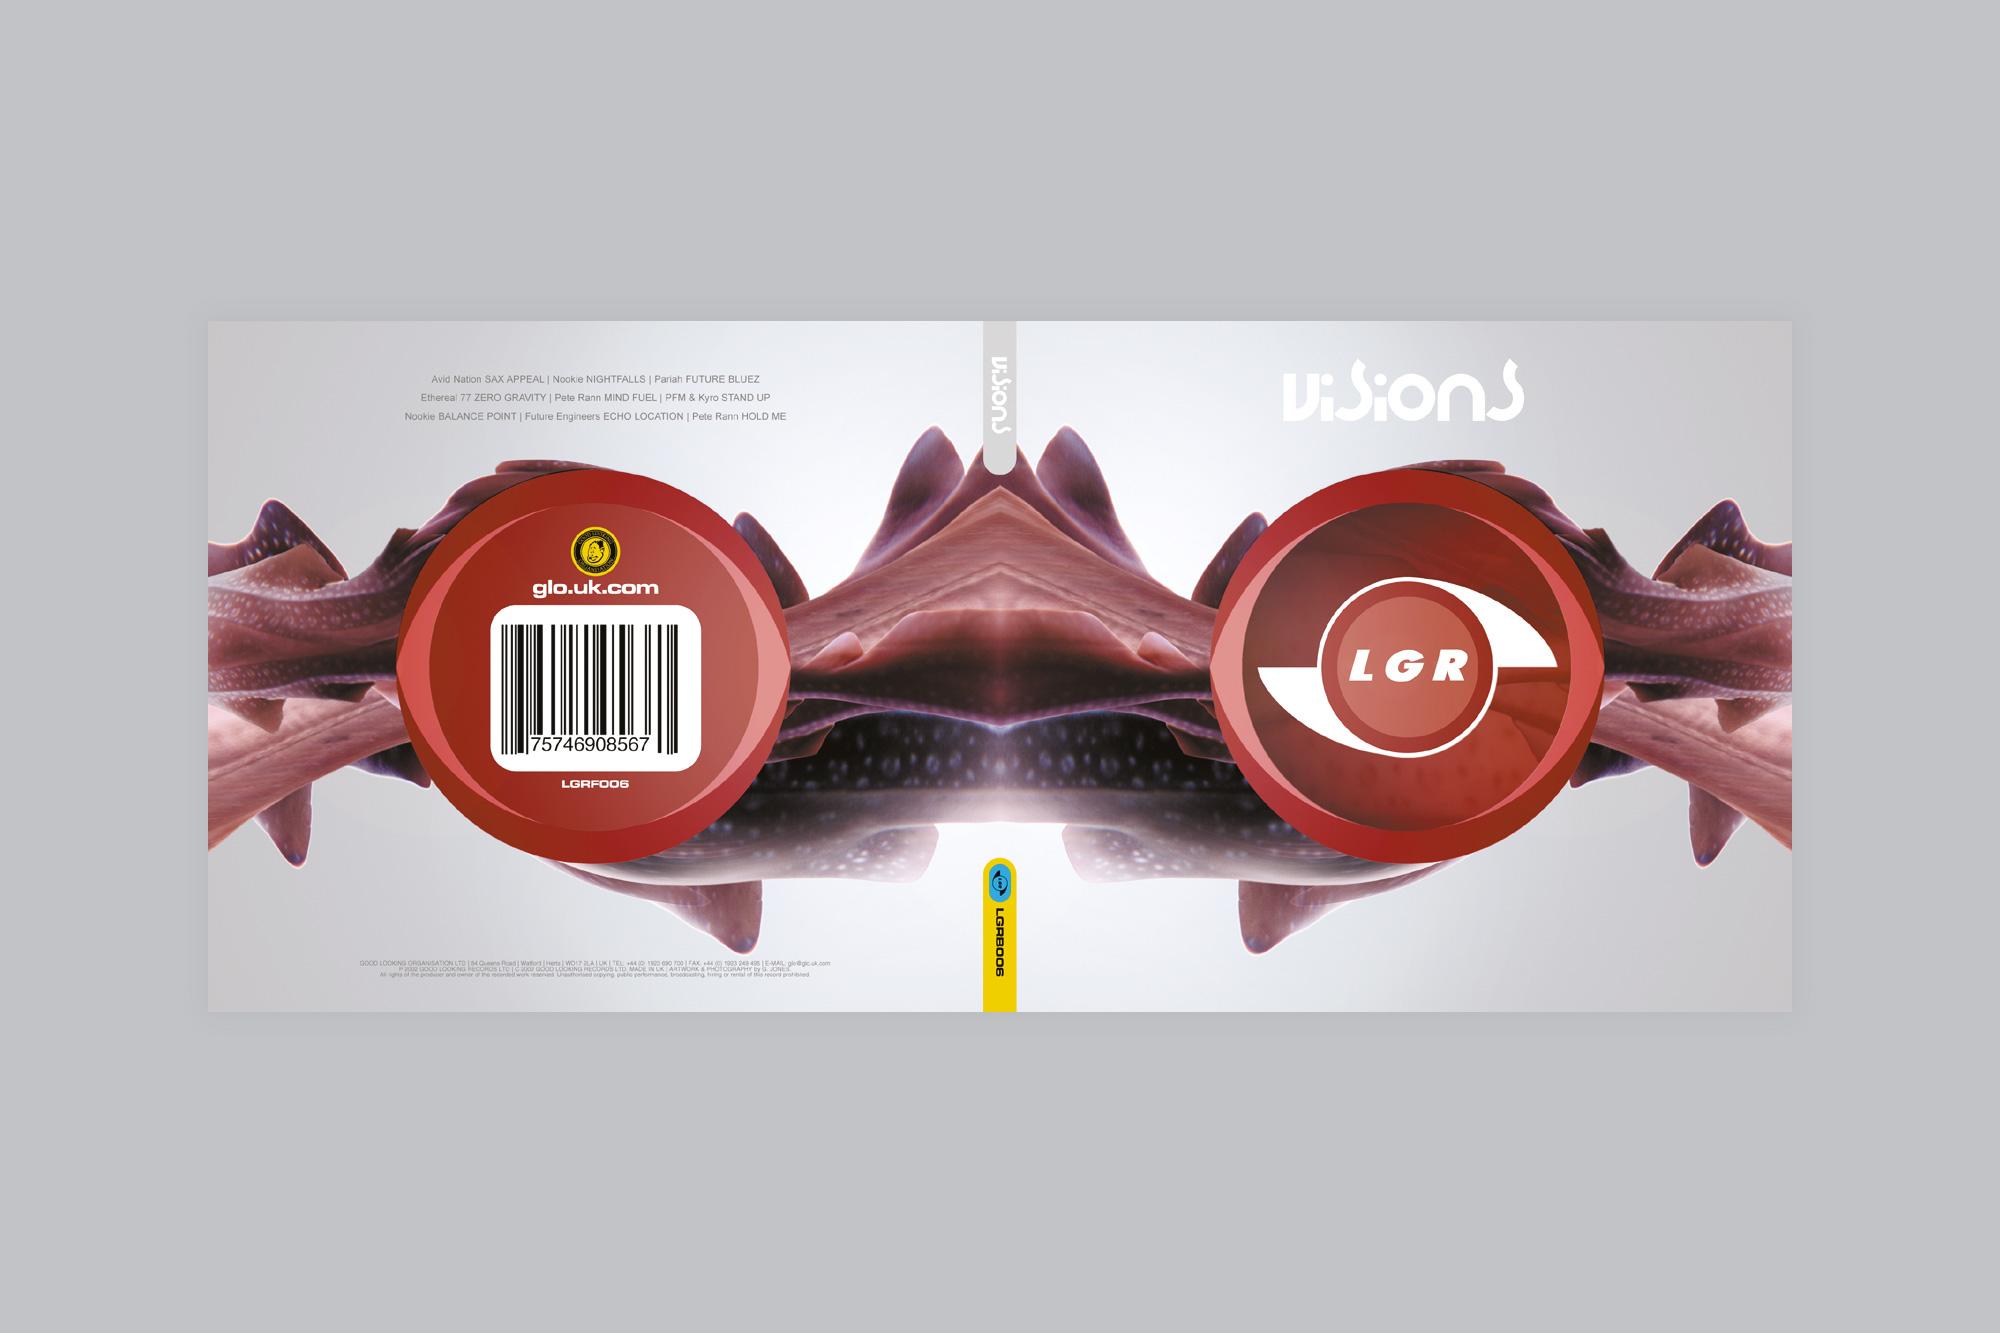 gareth-paul-jones-studio-design-looking-good-records-lp-visions-case-study-04